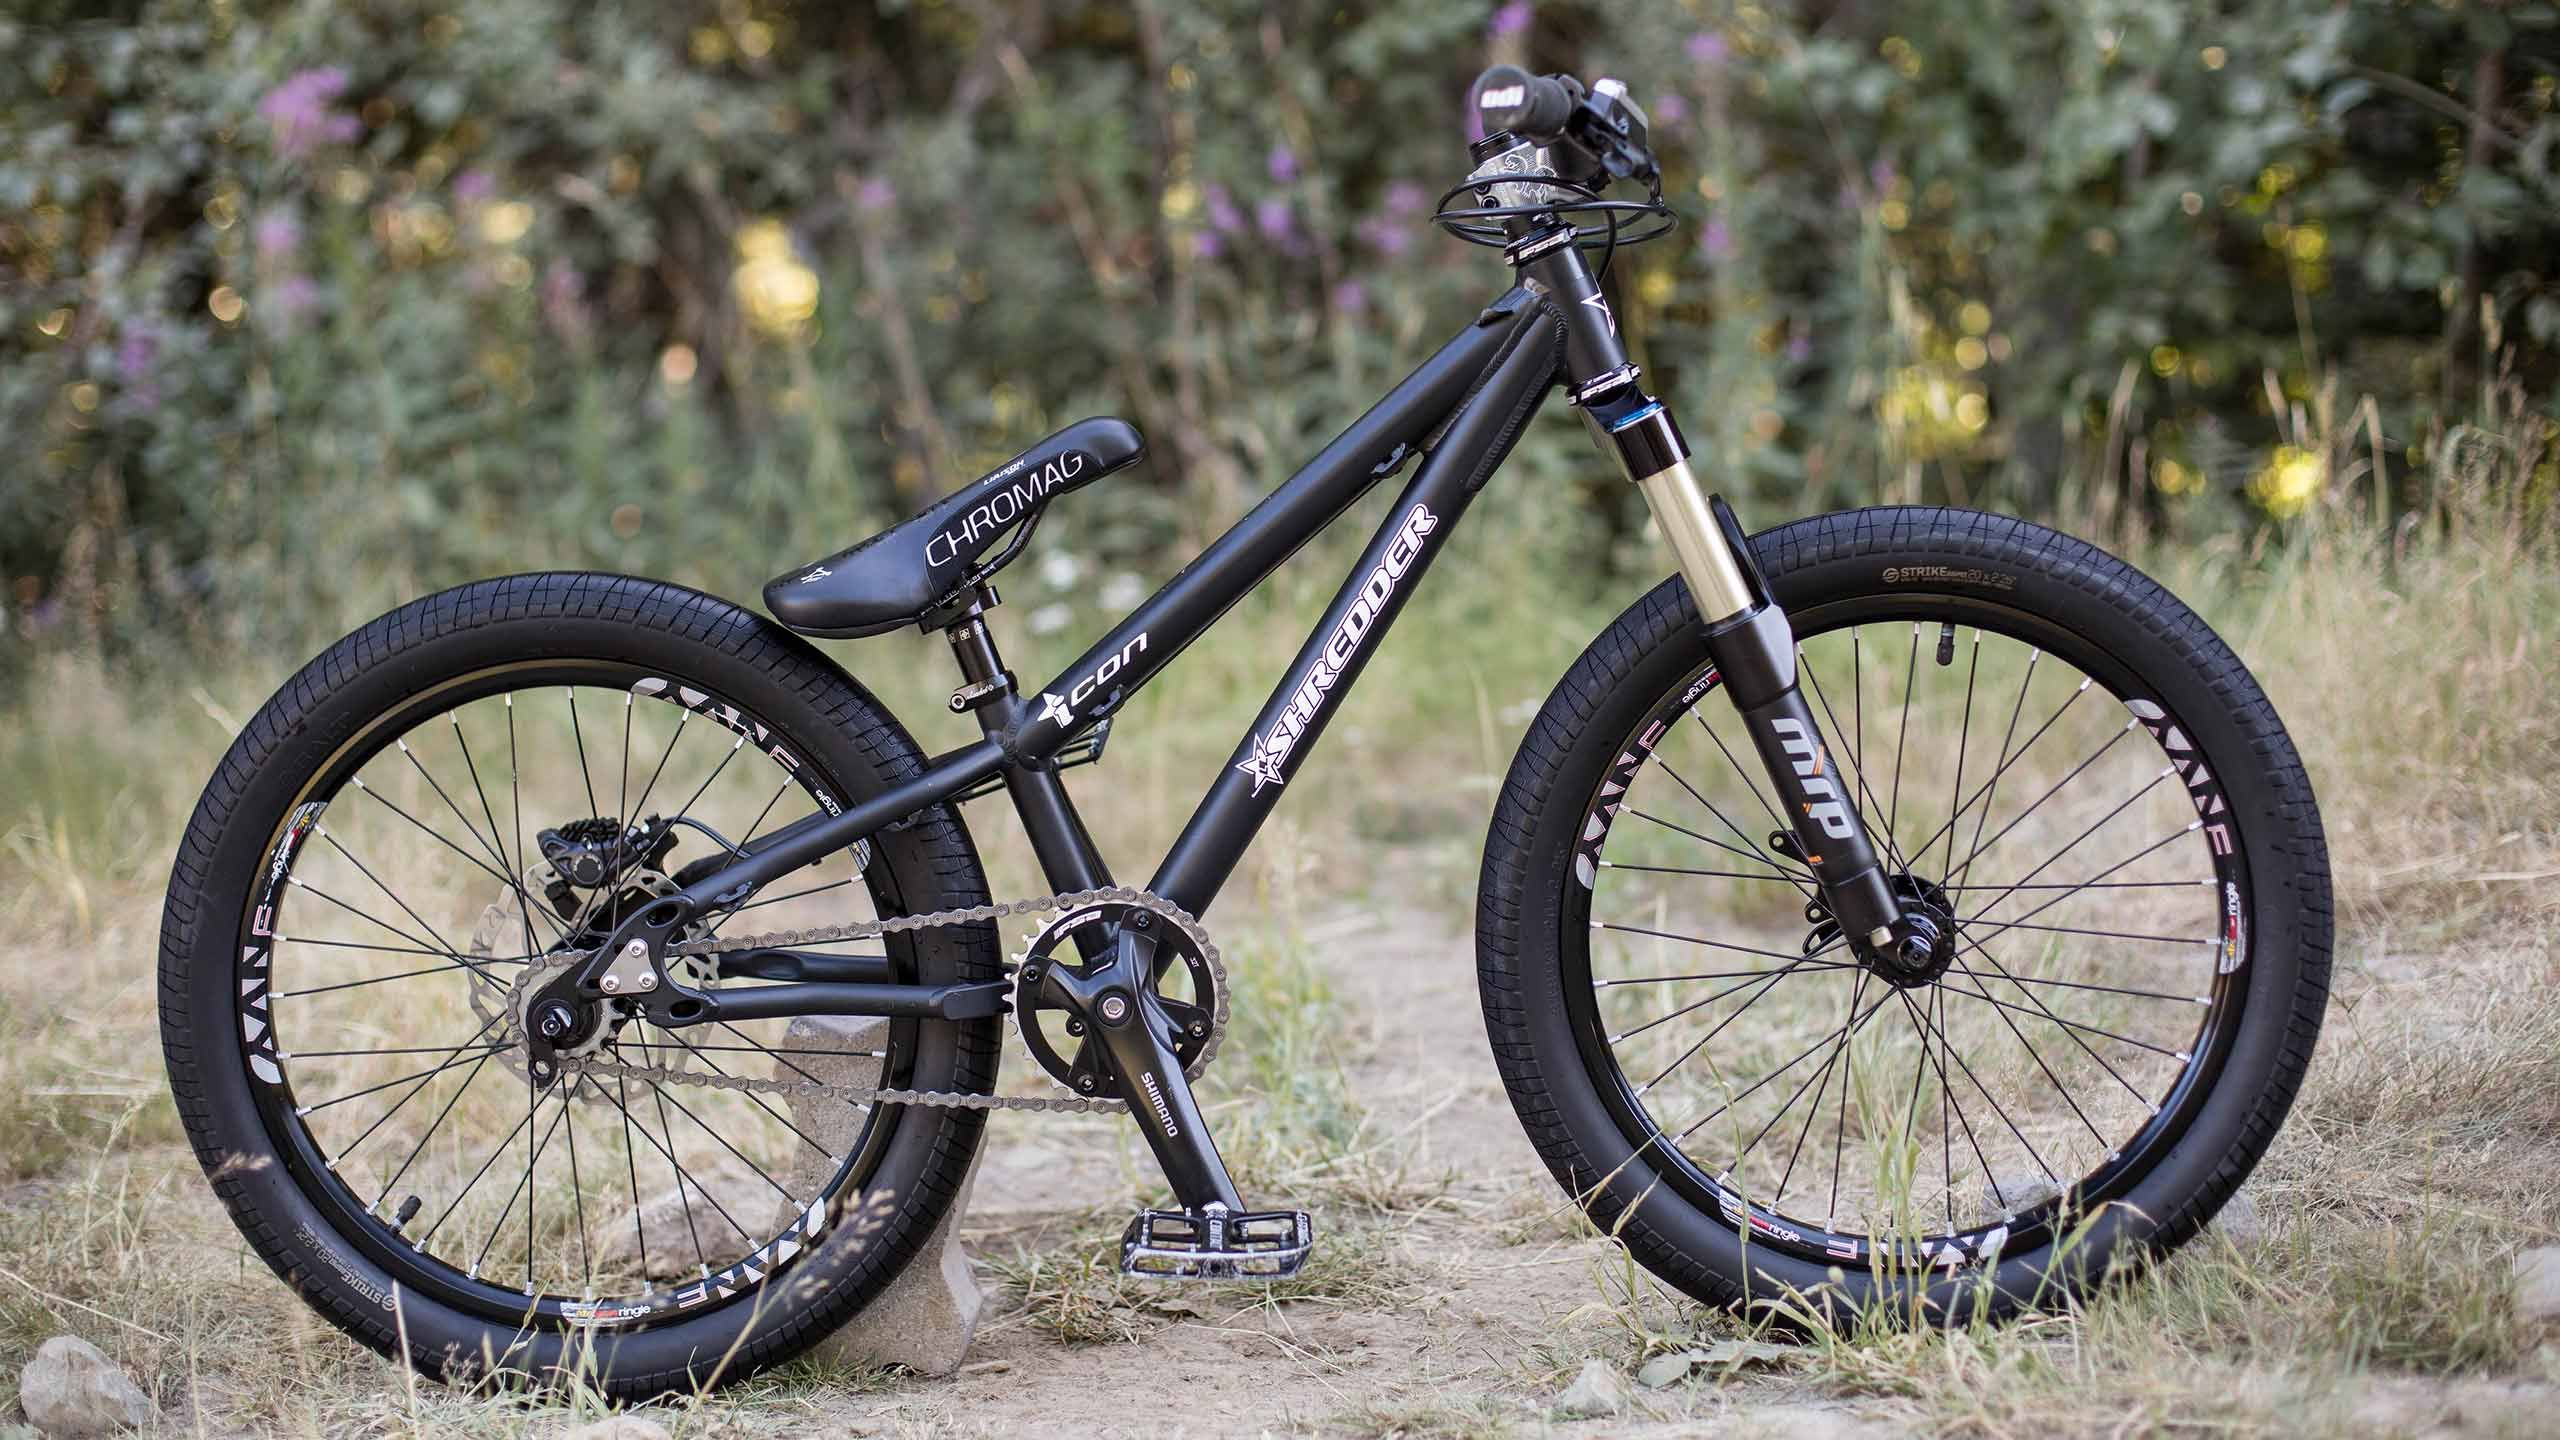 Lil Shredder Icon Kids Mountain Bikes Dirt Jumper Cool Bikes